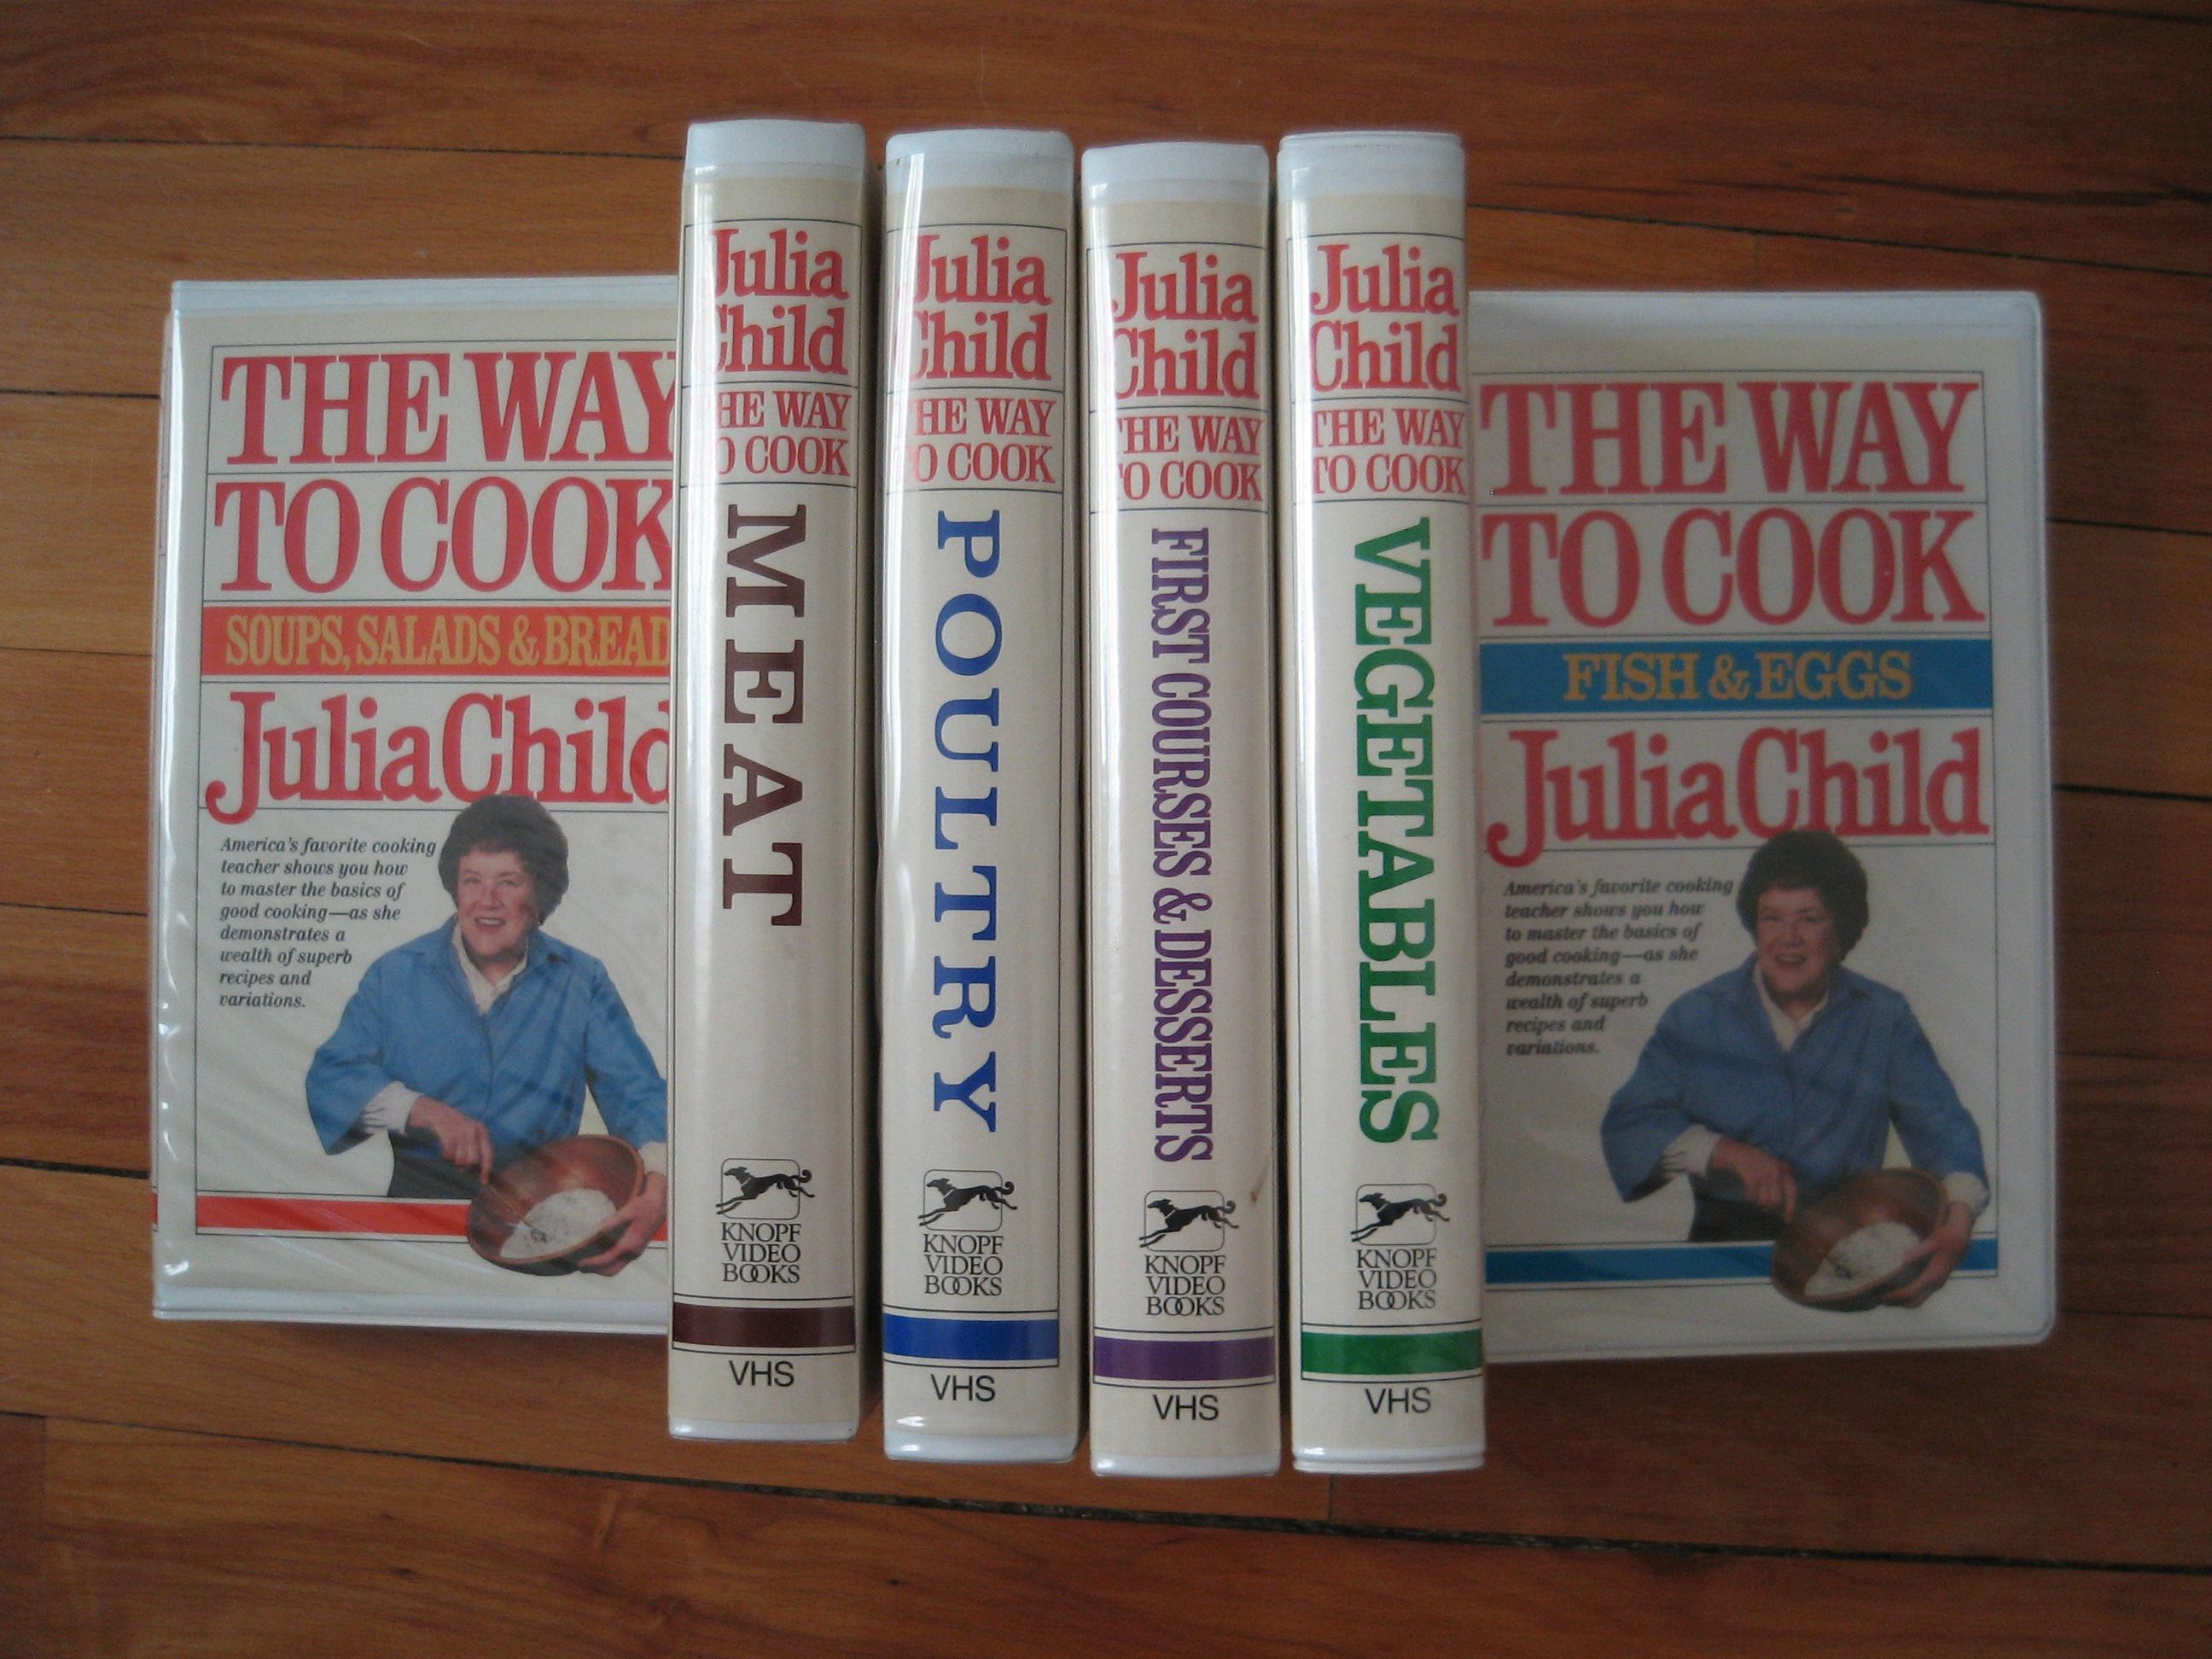 Julia Child Videos